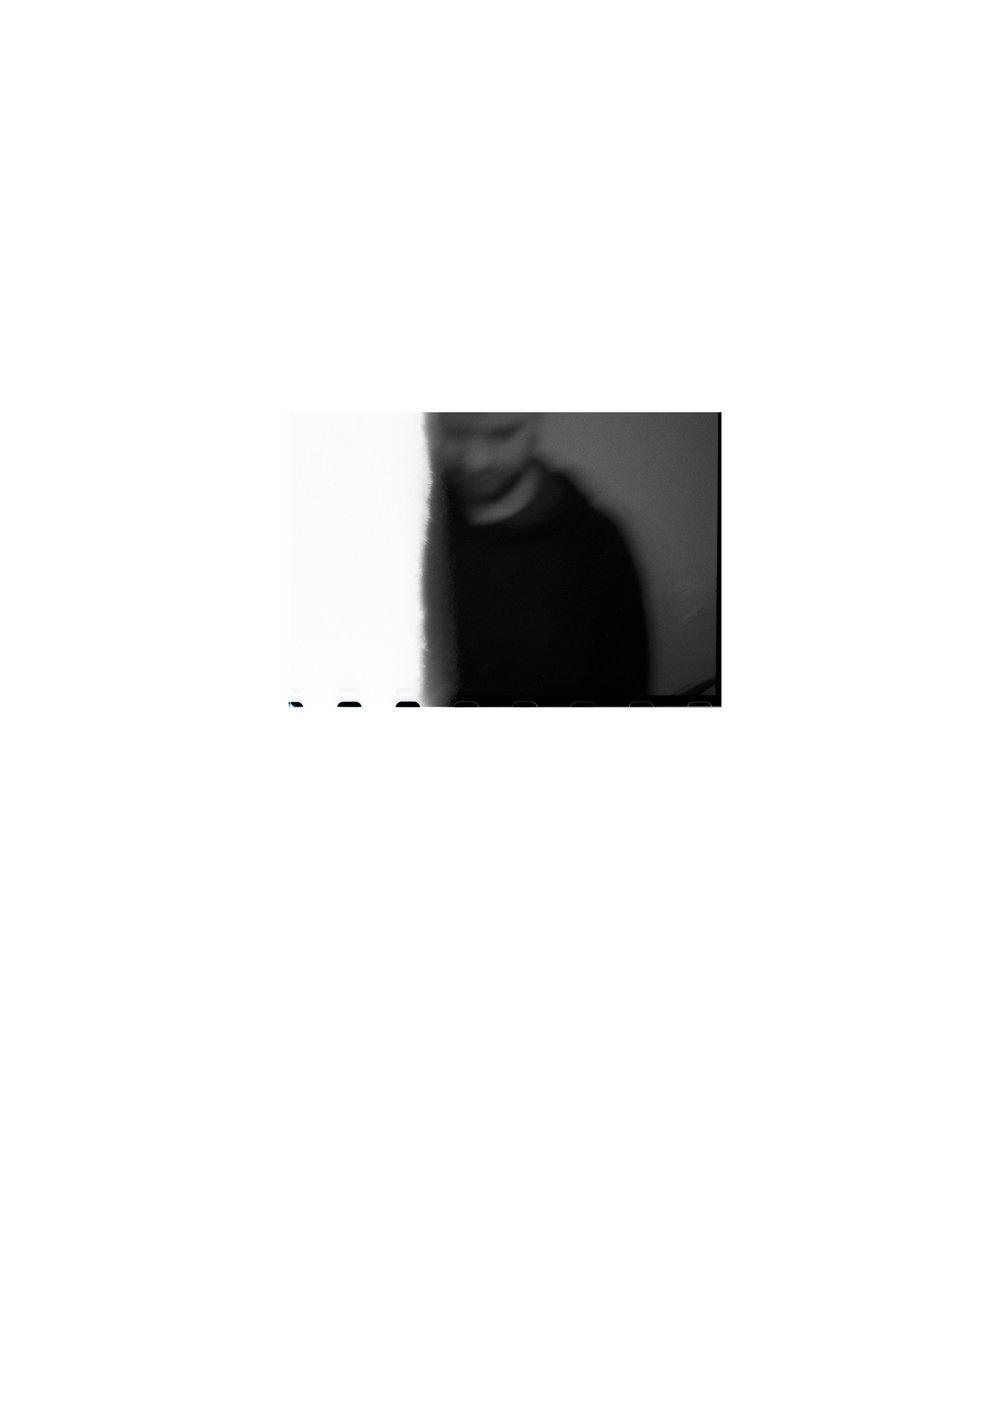 Fata_layout2707_hjemmeside46.jpg